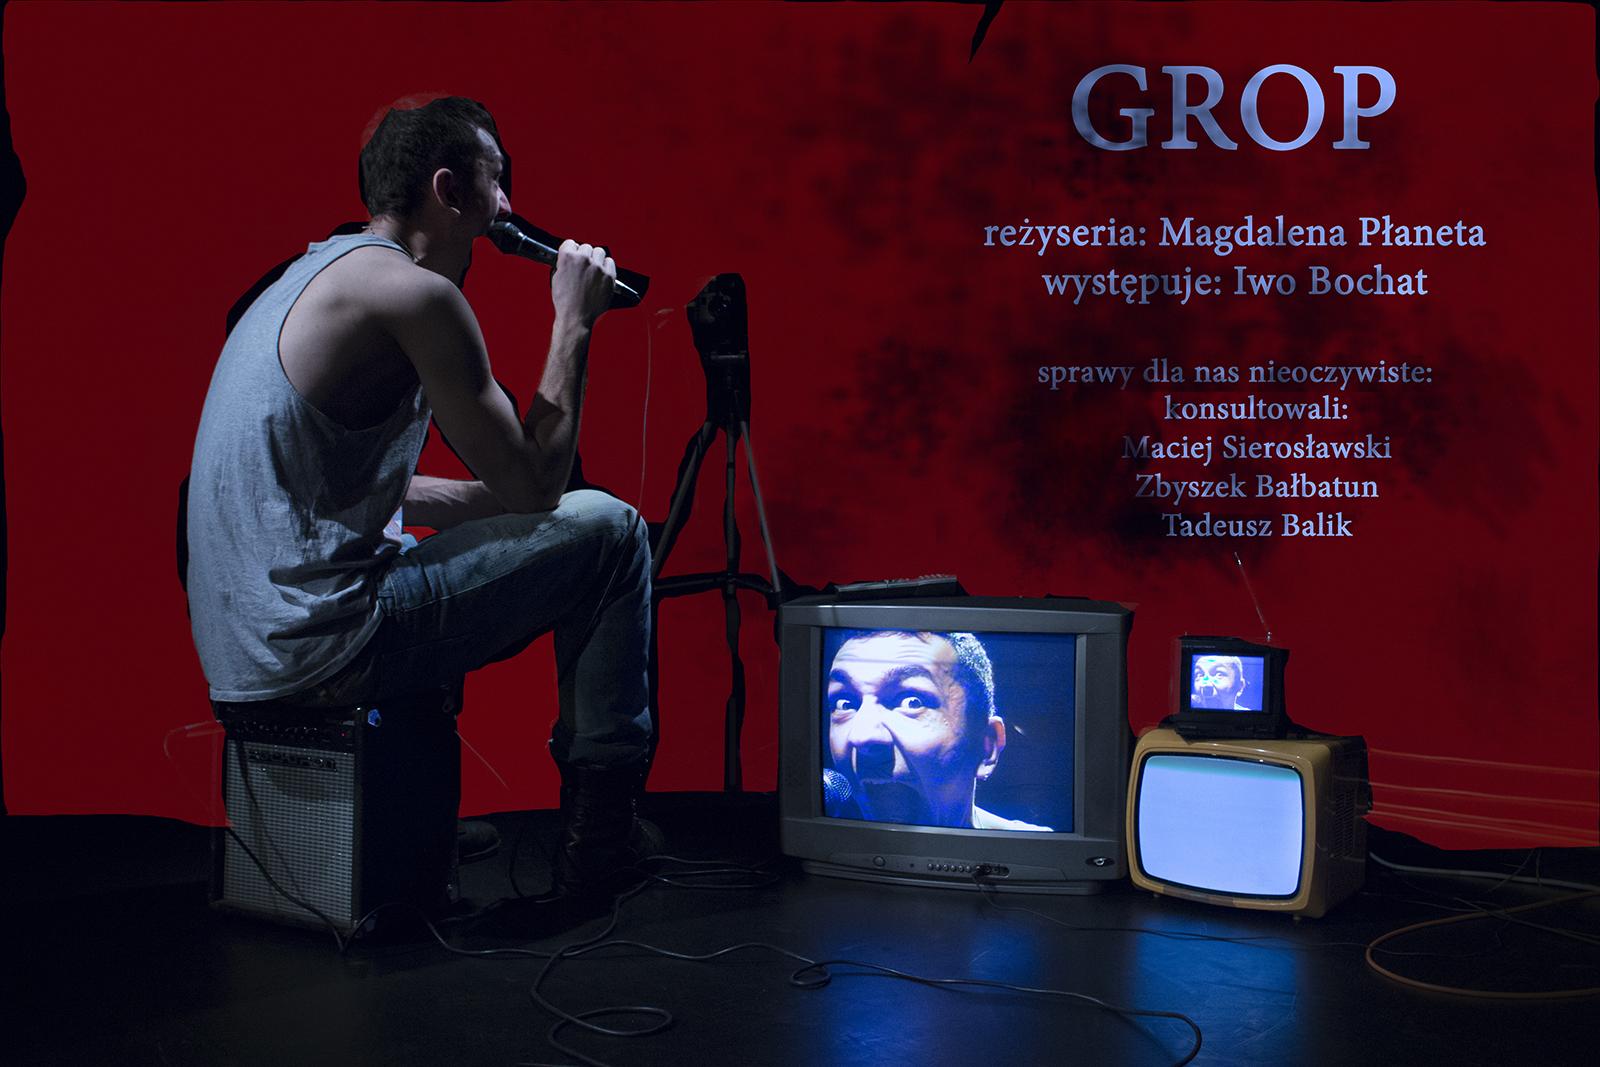 Plakat Grop (bez paska) - mały romiar